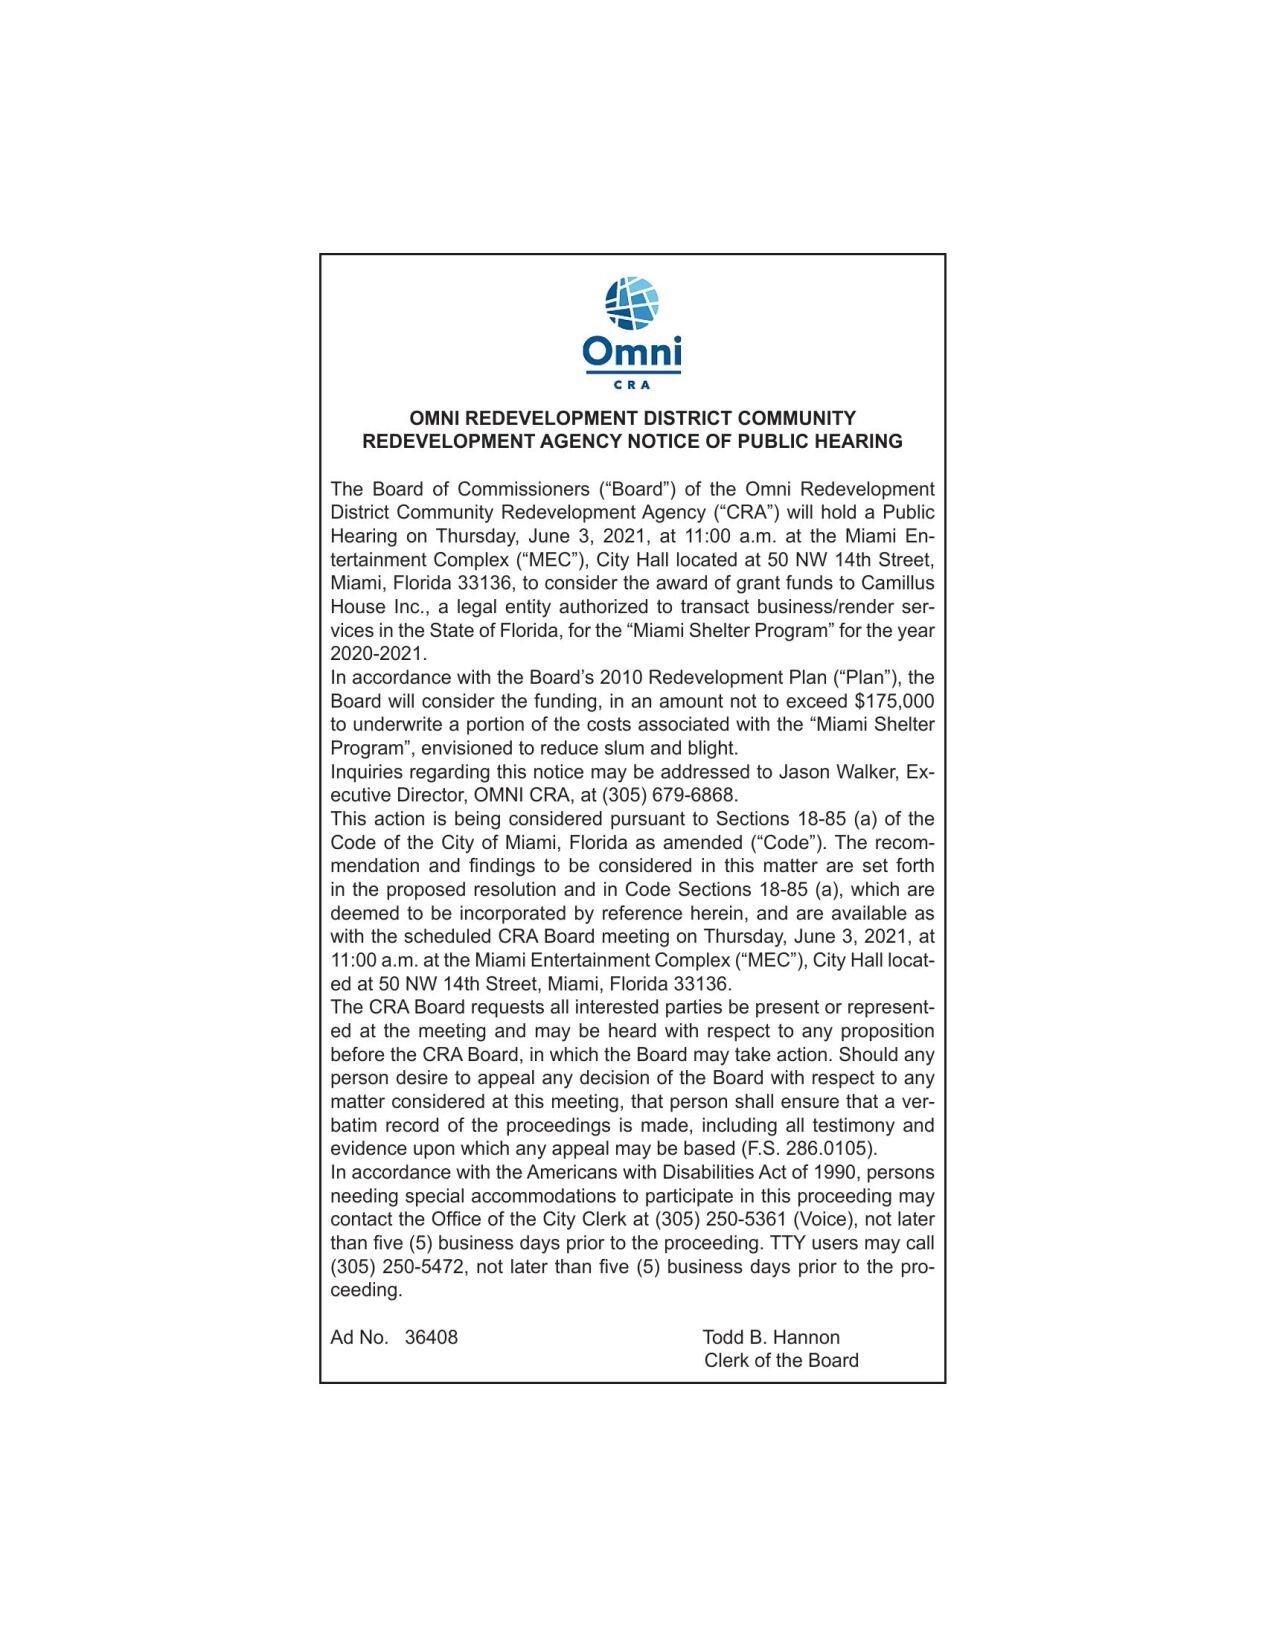 OMNI REDEVELOPMENT DISTRICT COMMUNITY